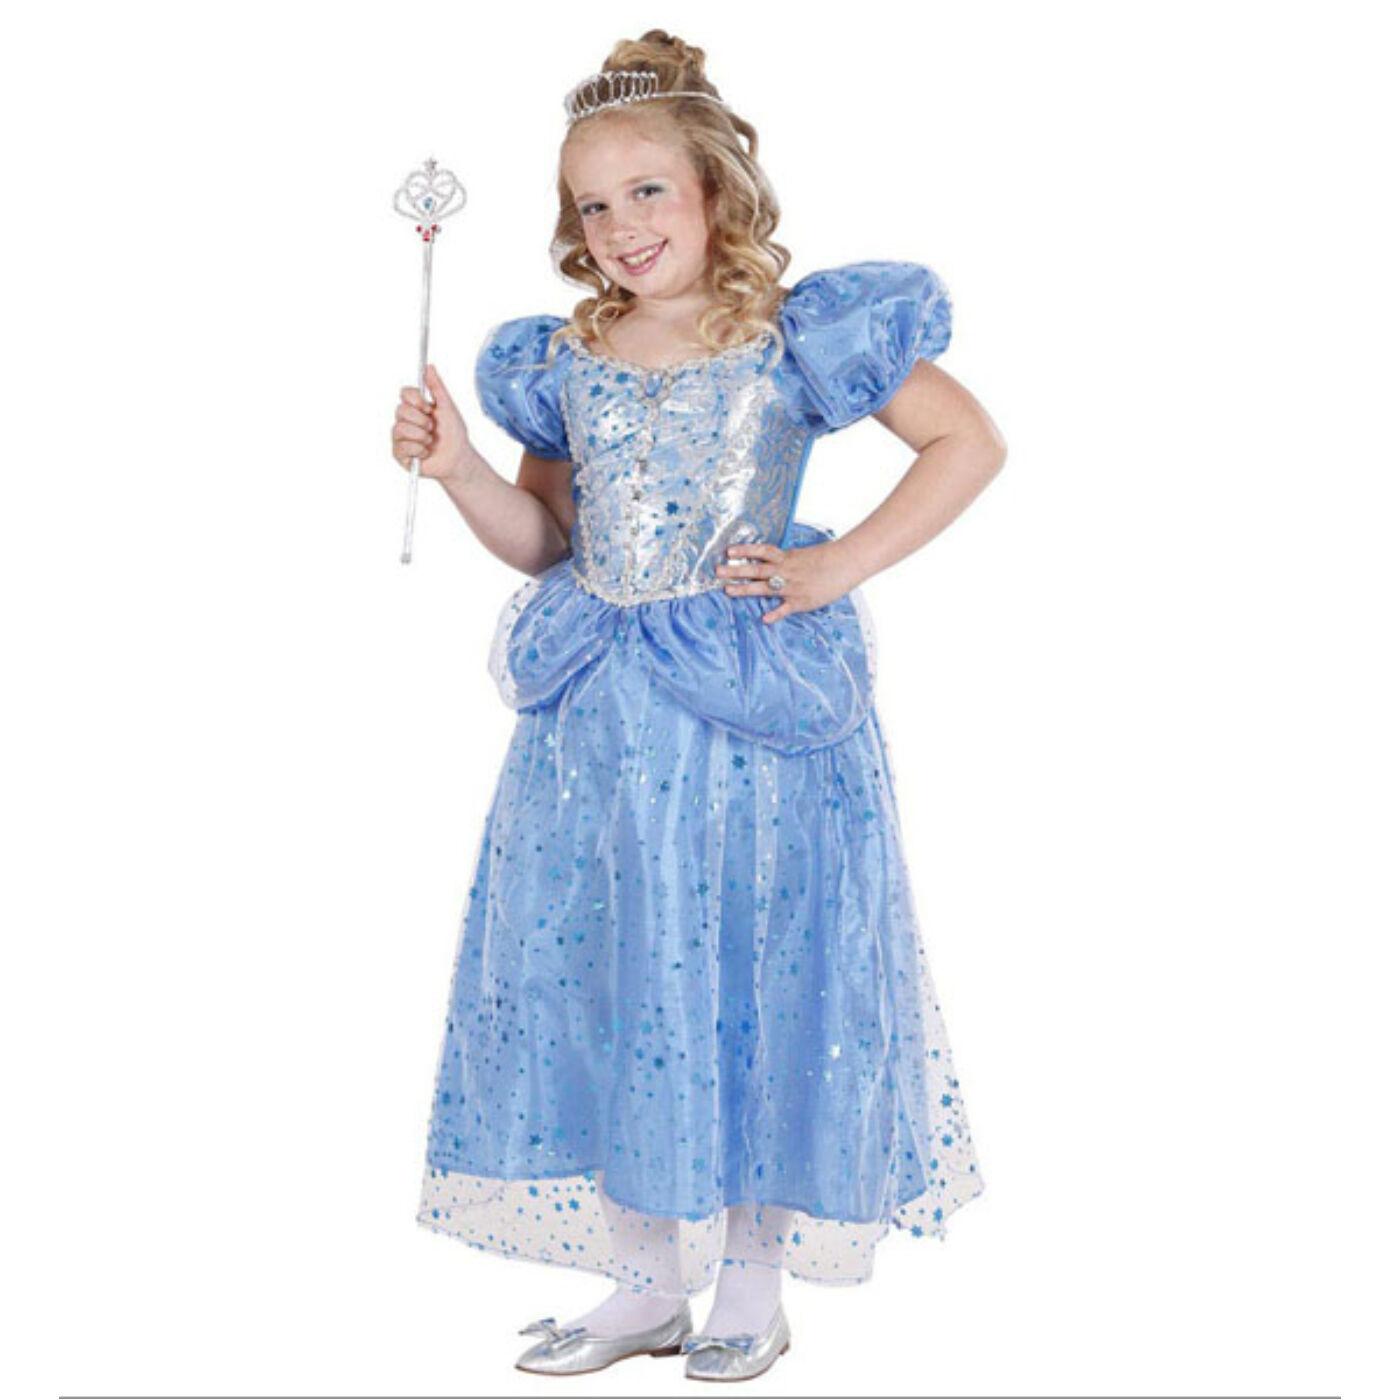 hercegnő jelmez